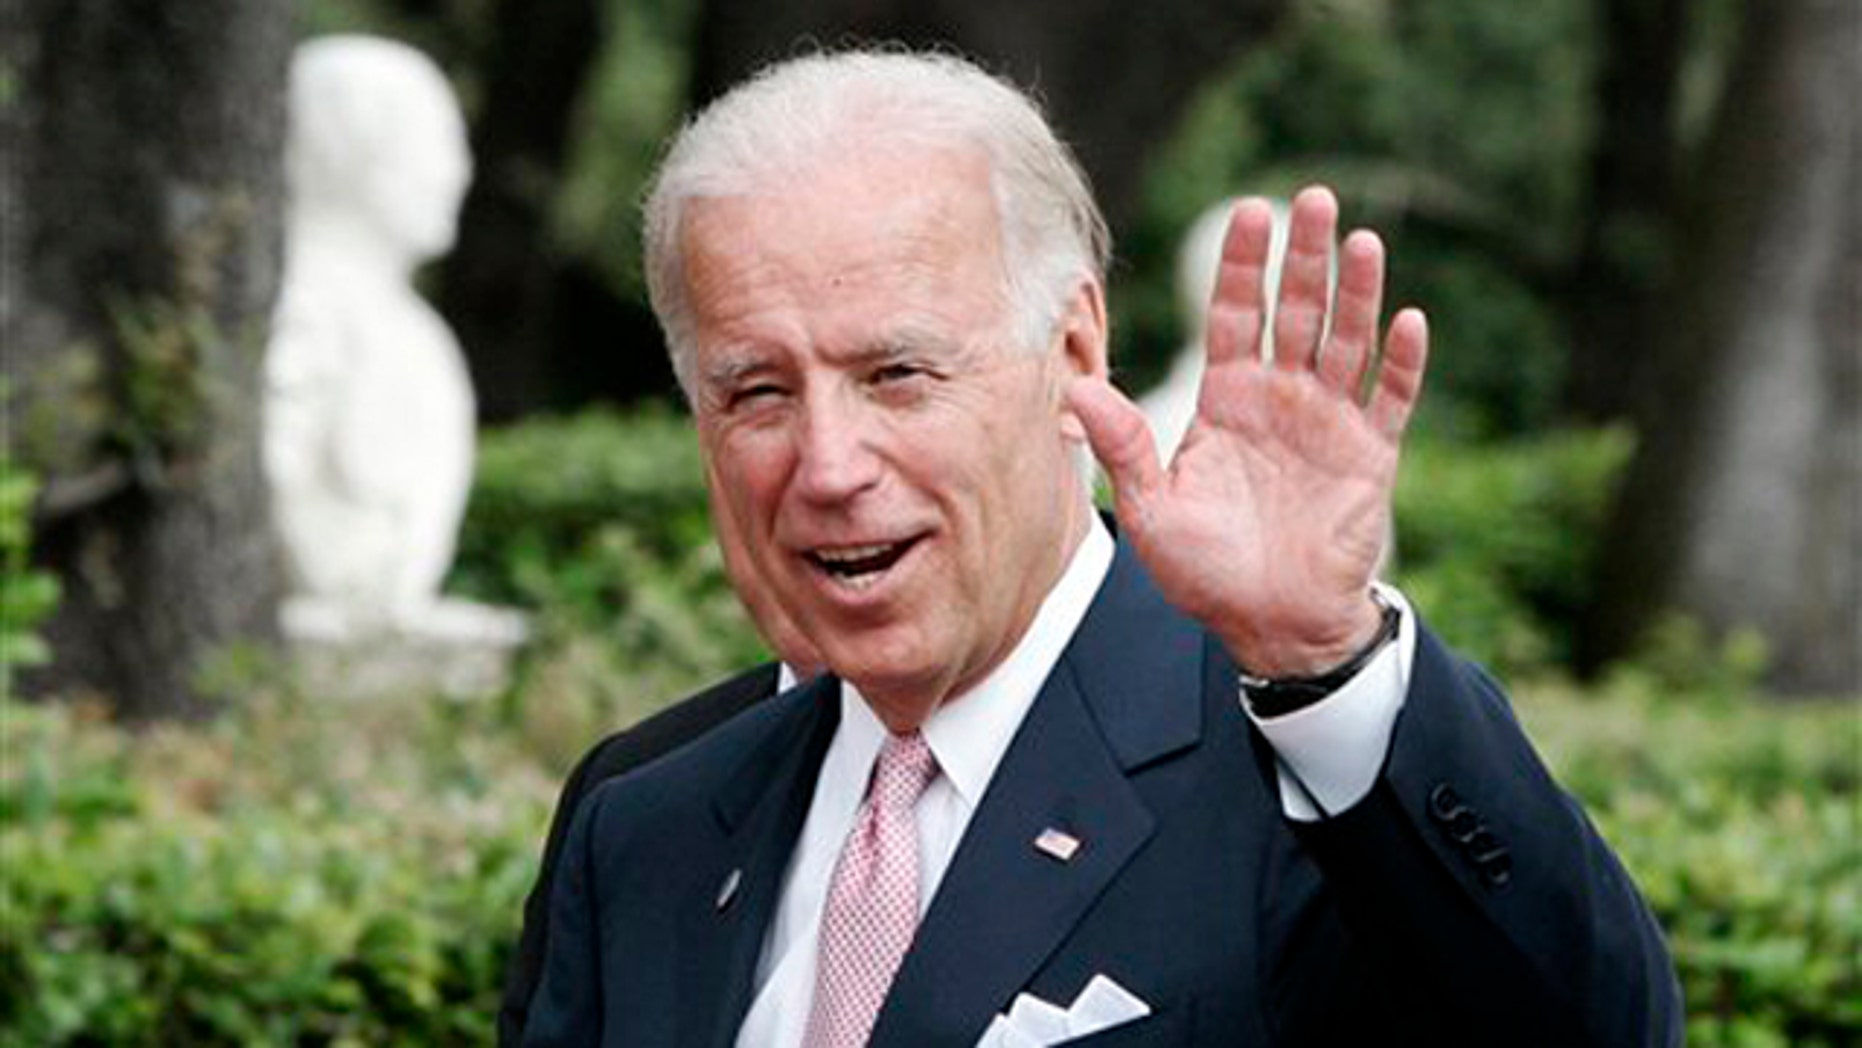 Vice President Joe Biden waves at Rome's Villa Doria Pamphili June 2.